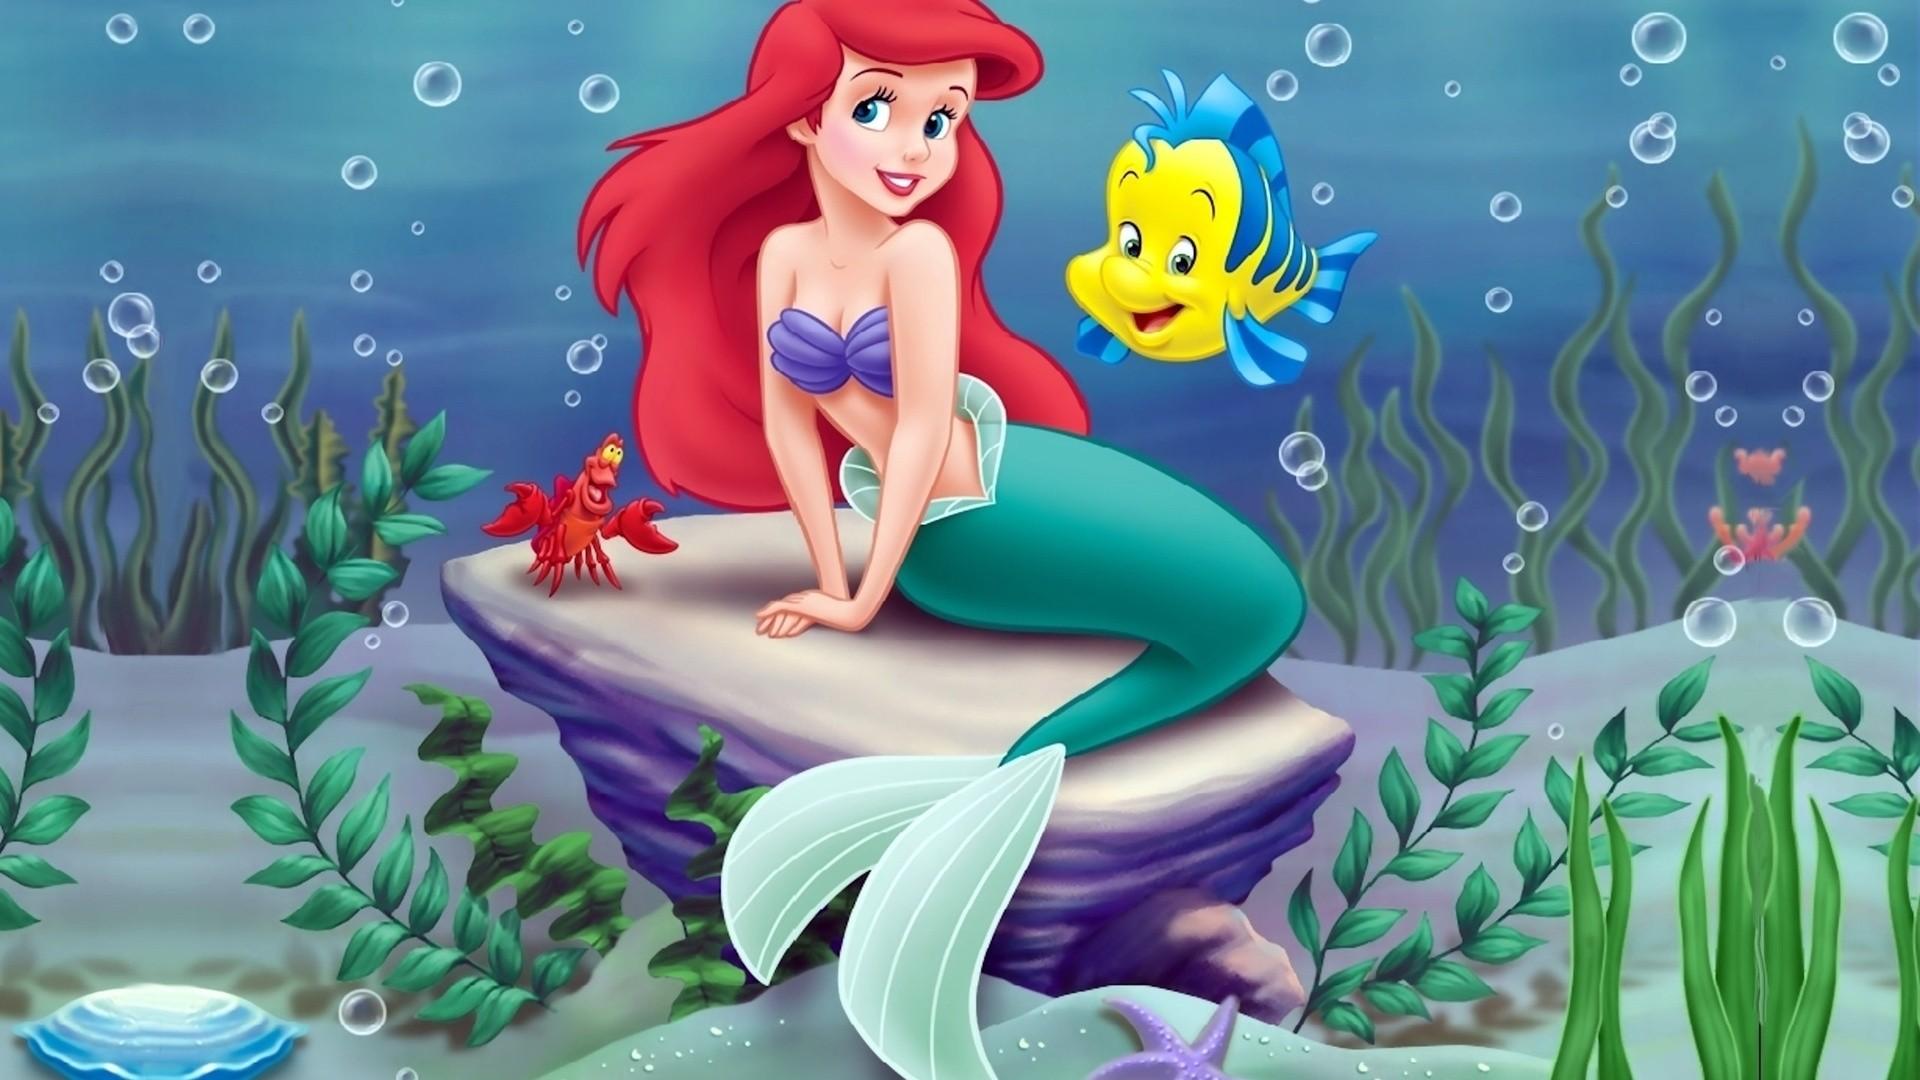 Mermaids Wallpaper theme